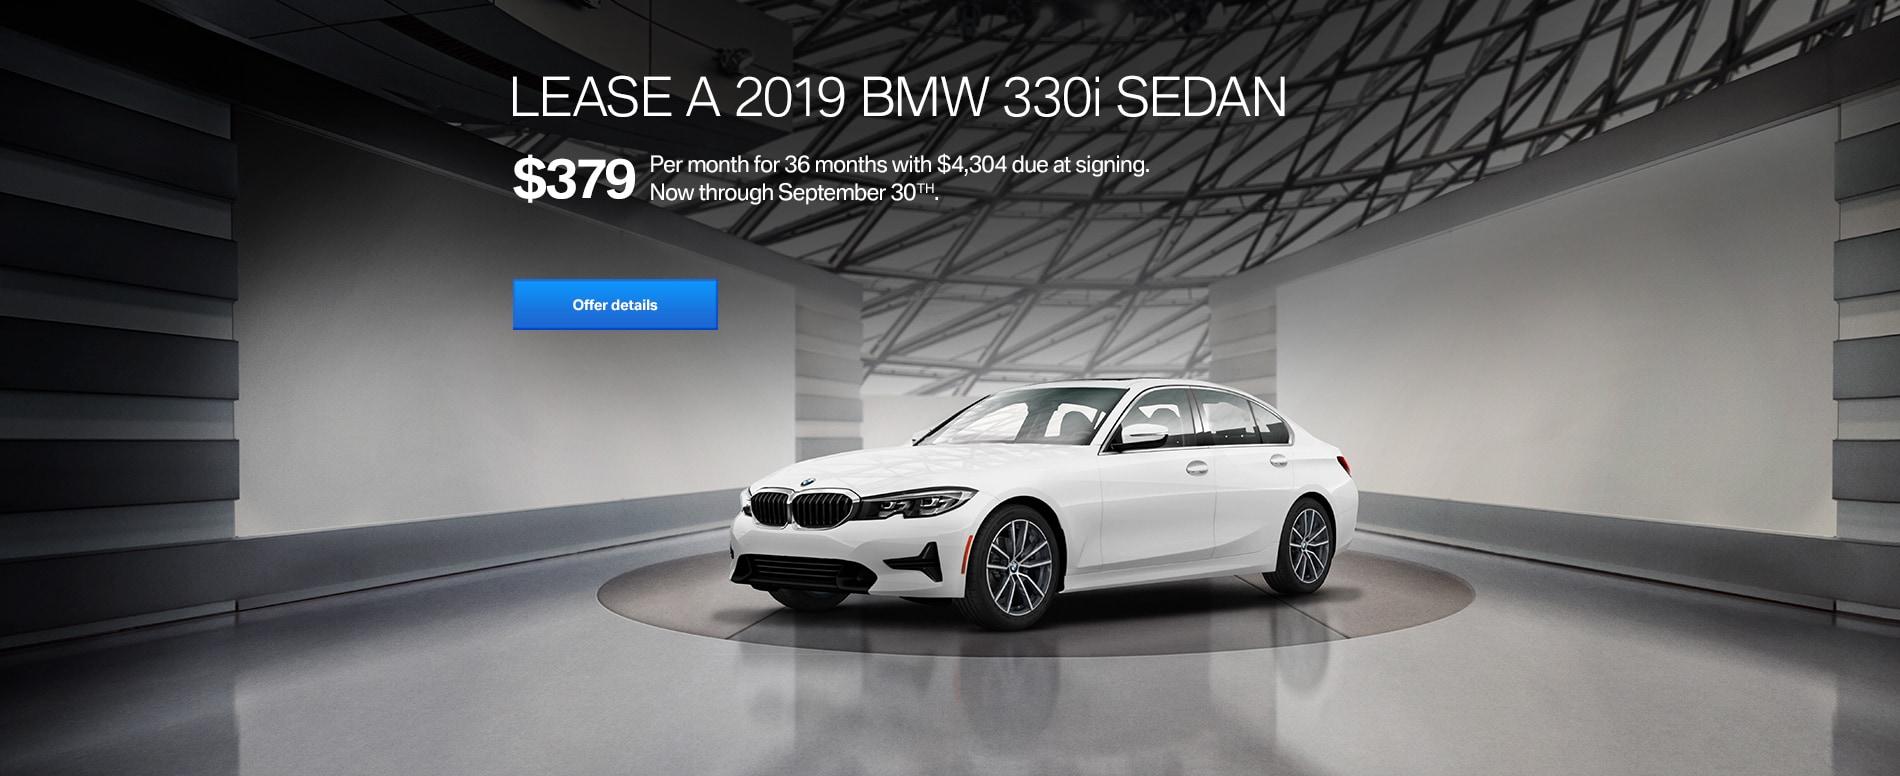 BMW of Maui | New BMW Dealership in Kahului, HI